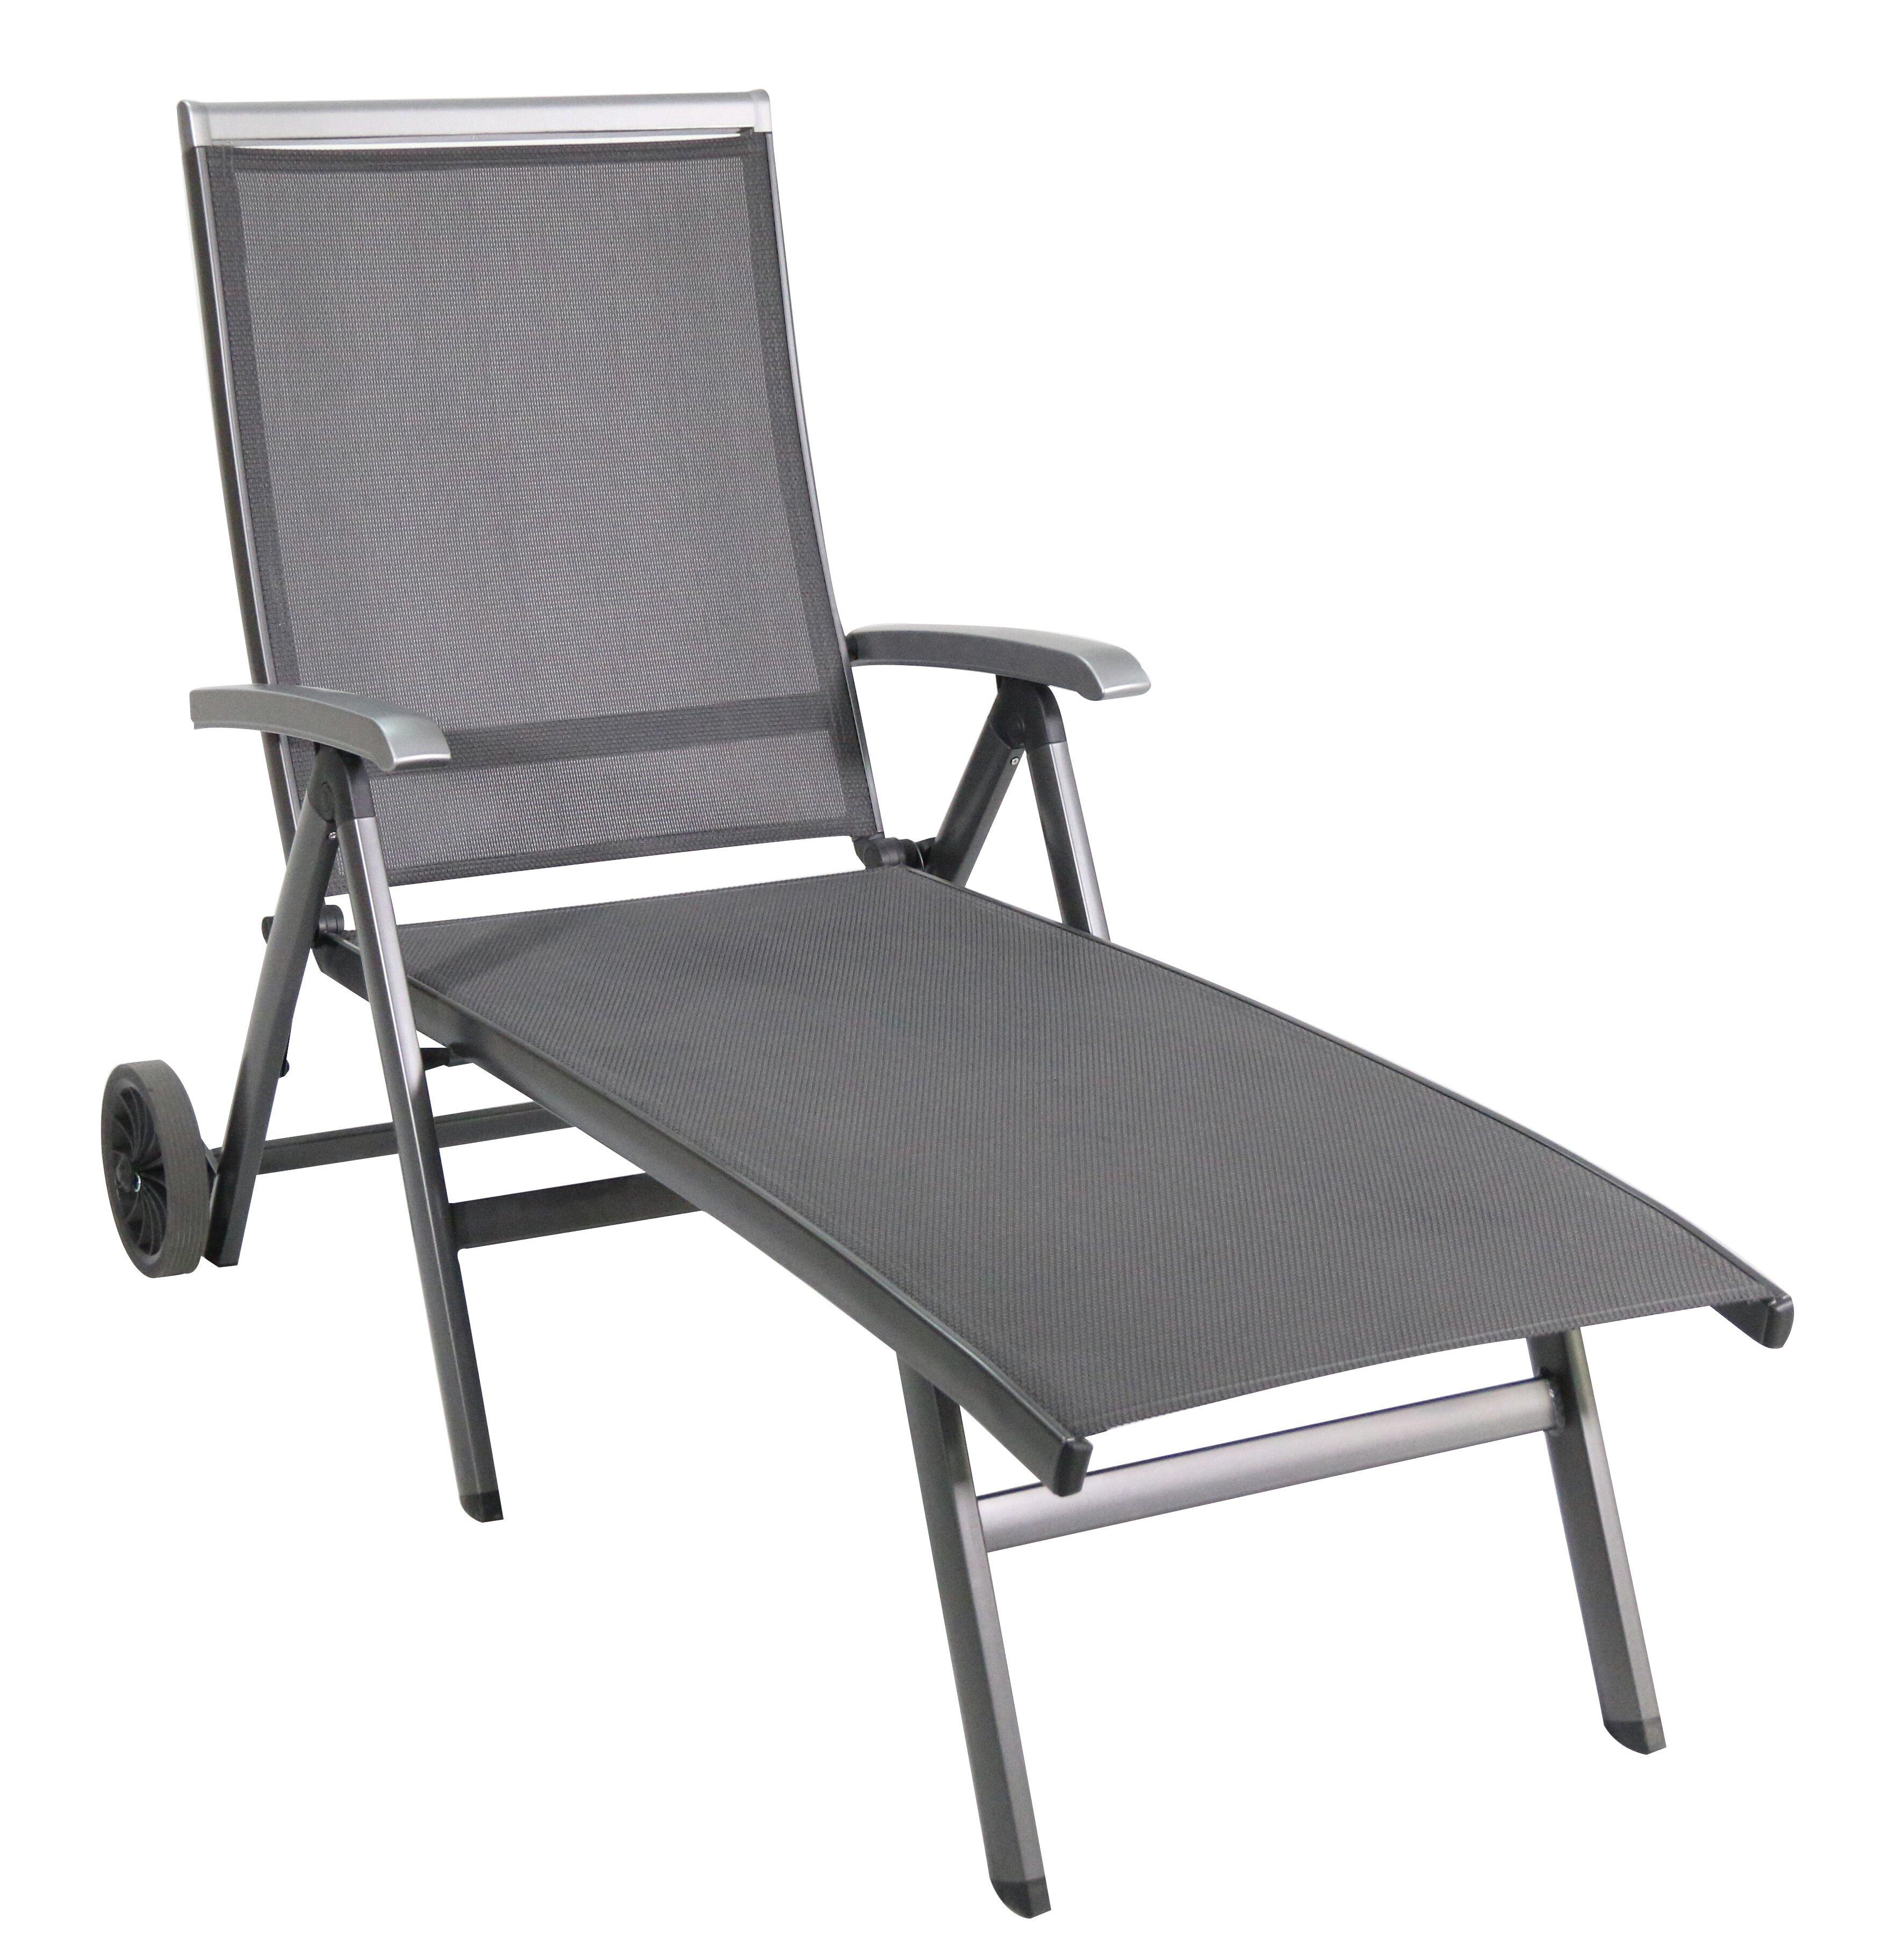 Royal Garden Outdoor Furniture Royal garden allmodern bristol caster chaise lounge workwithnaturefo